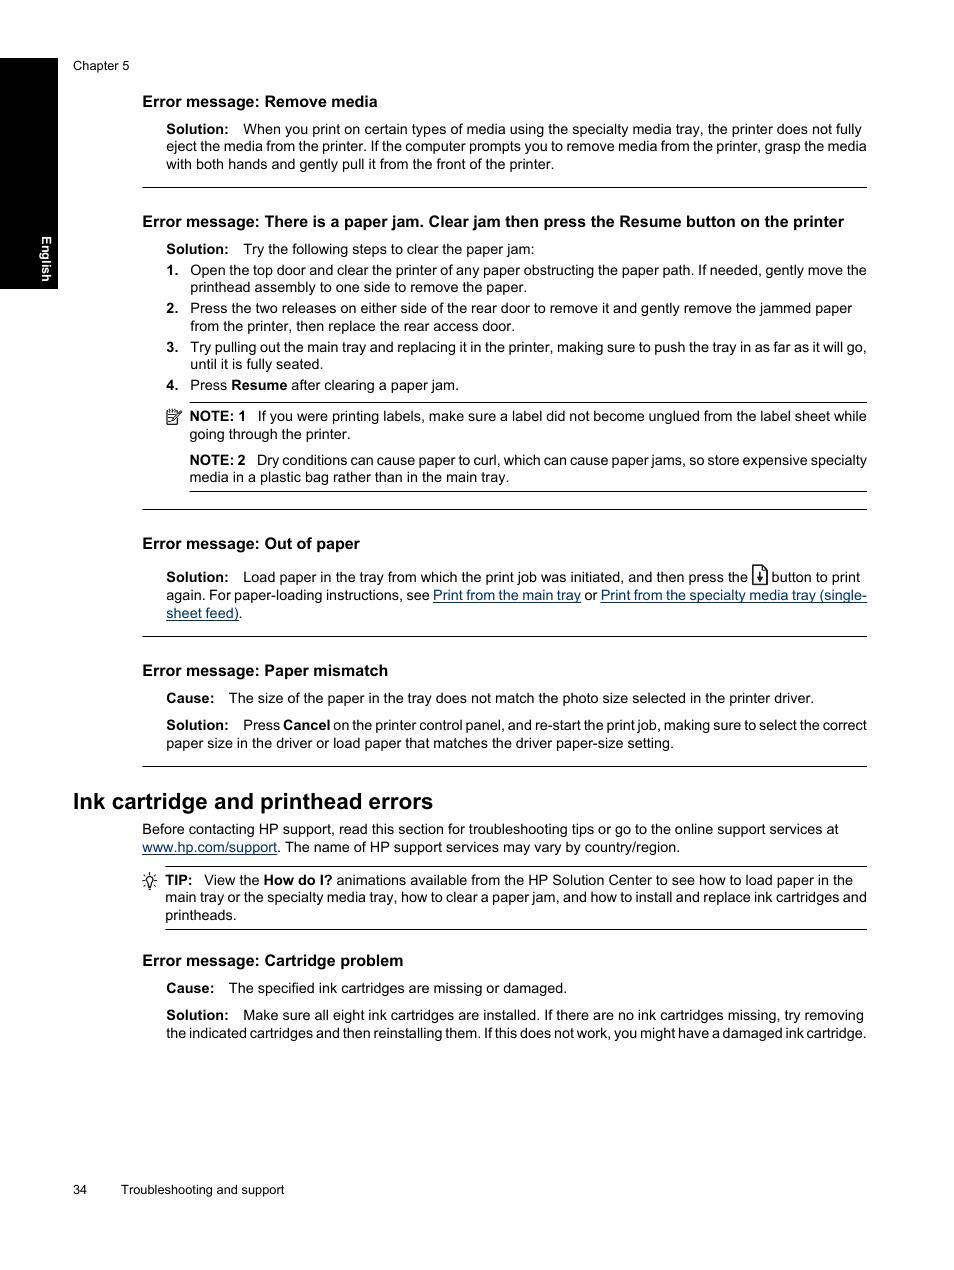 Paper Mismatch Error Galvinsdinnerhousestjoe Block Diagram Xeroxwc3045 Ink Cartridge And Printhead Errors Resume Button On The Printer Hp Photosmart Pro B8850